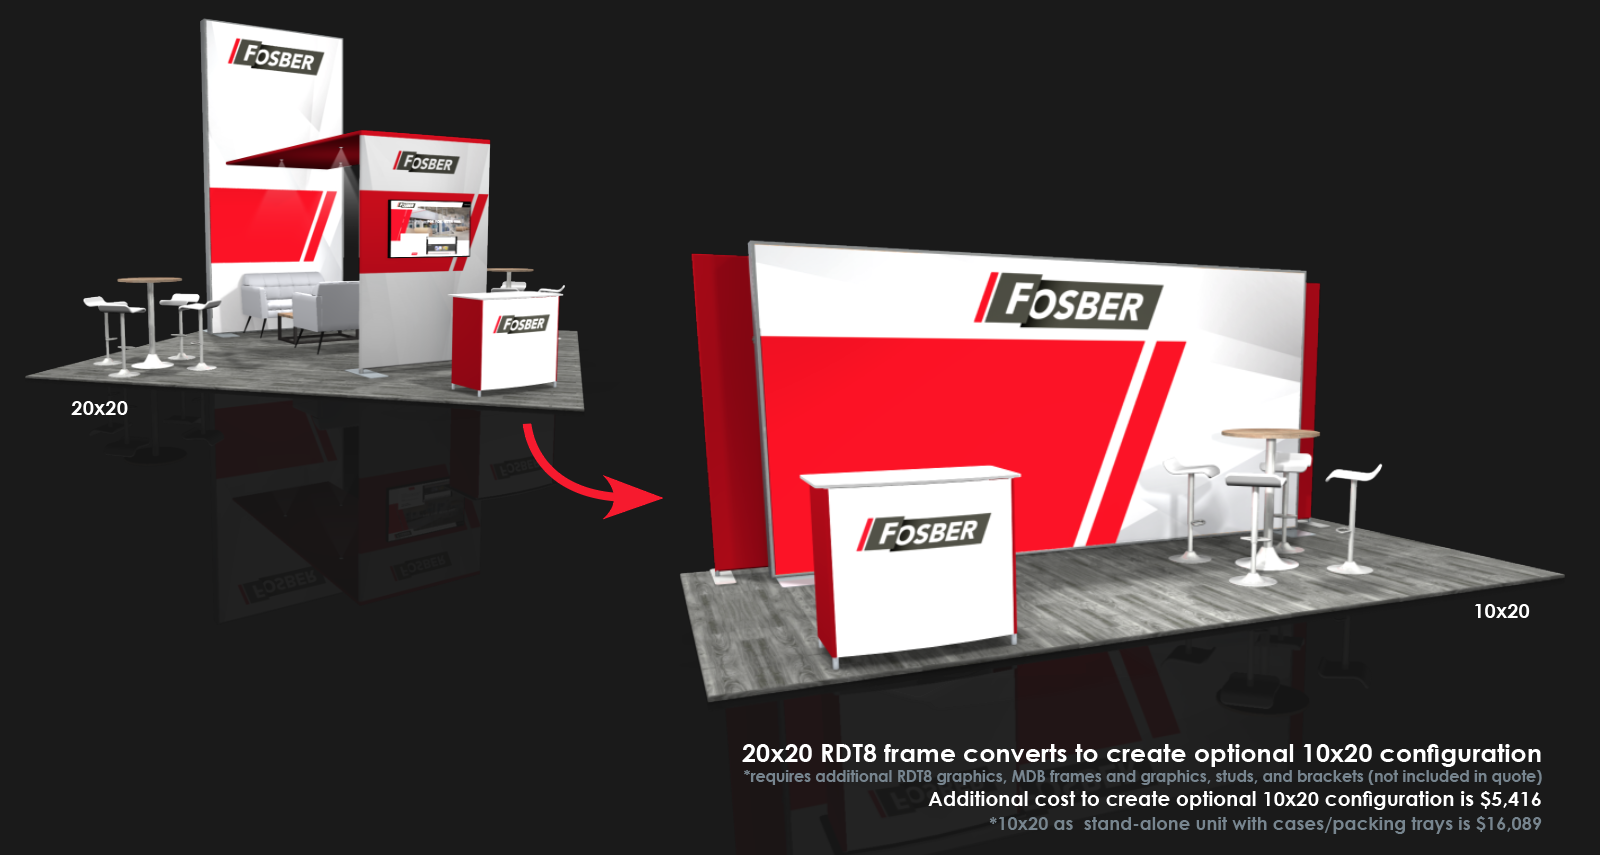 custom modular 20x20 converts to 10x20 trade show display